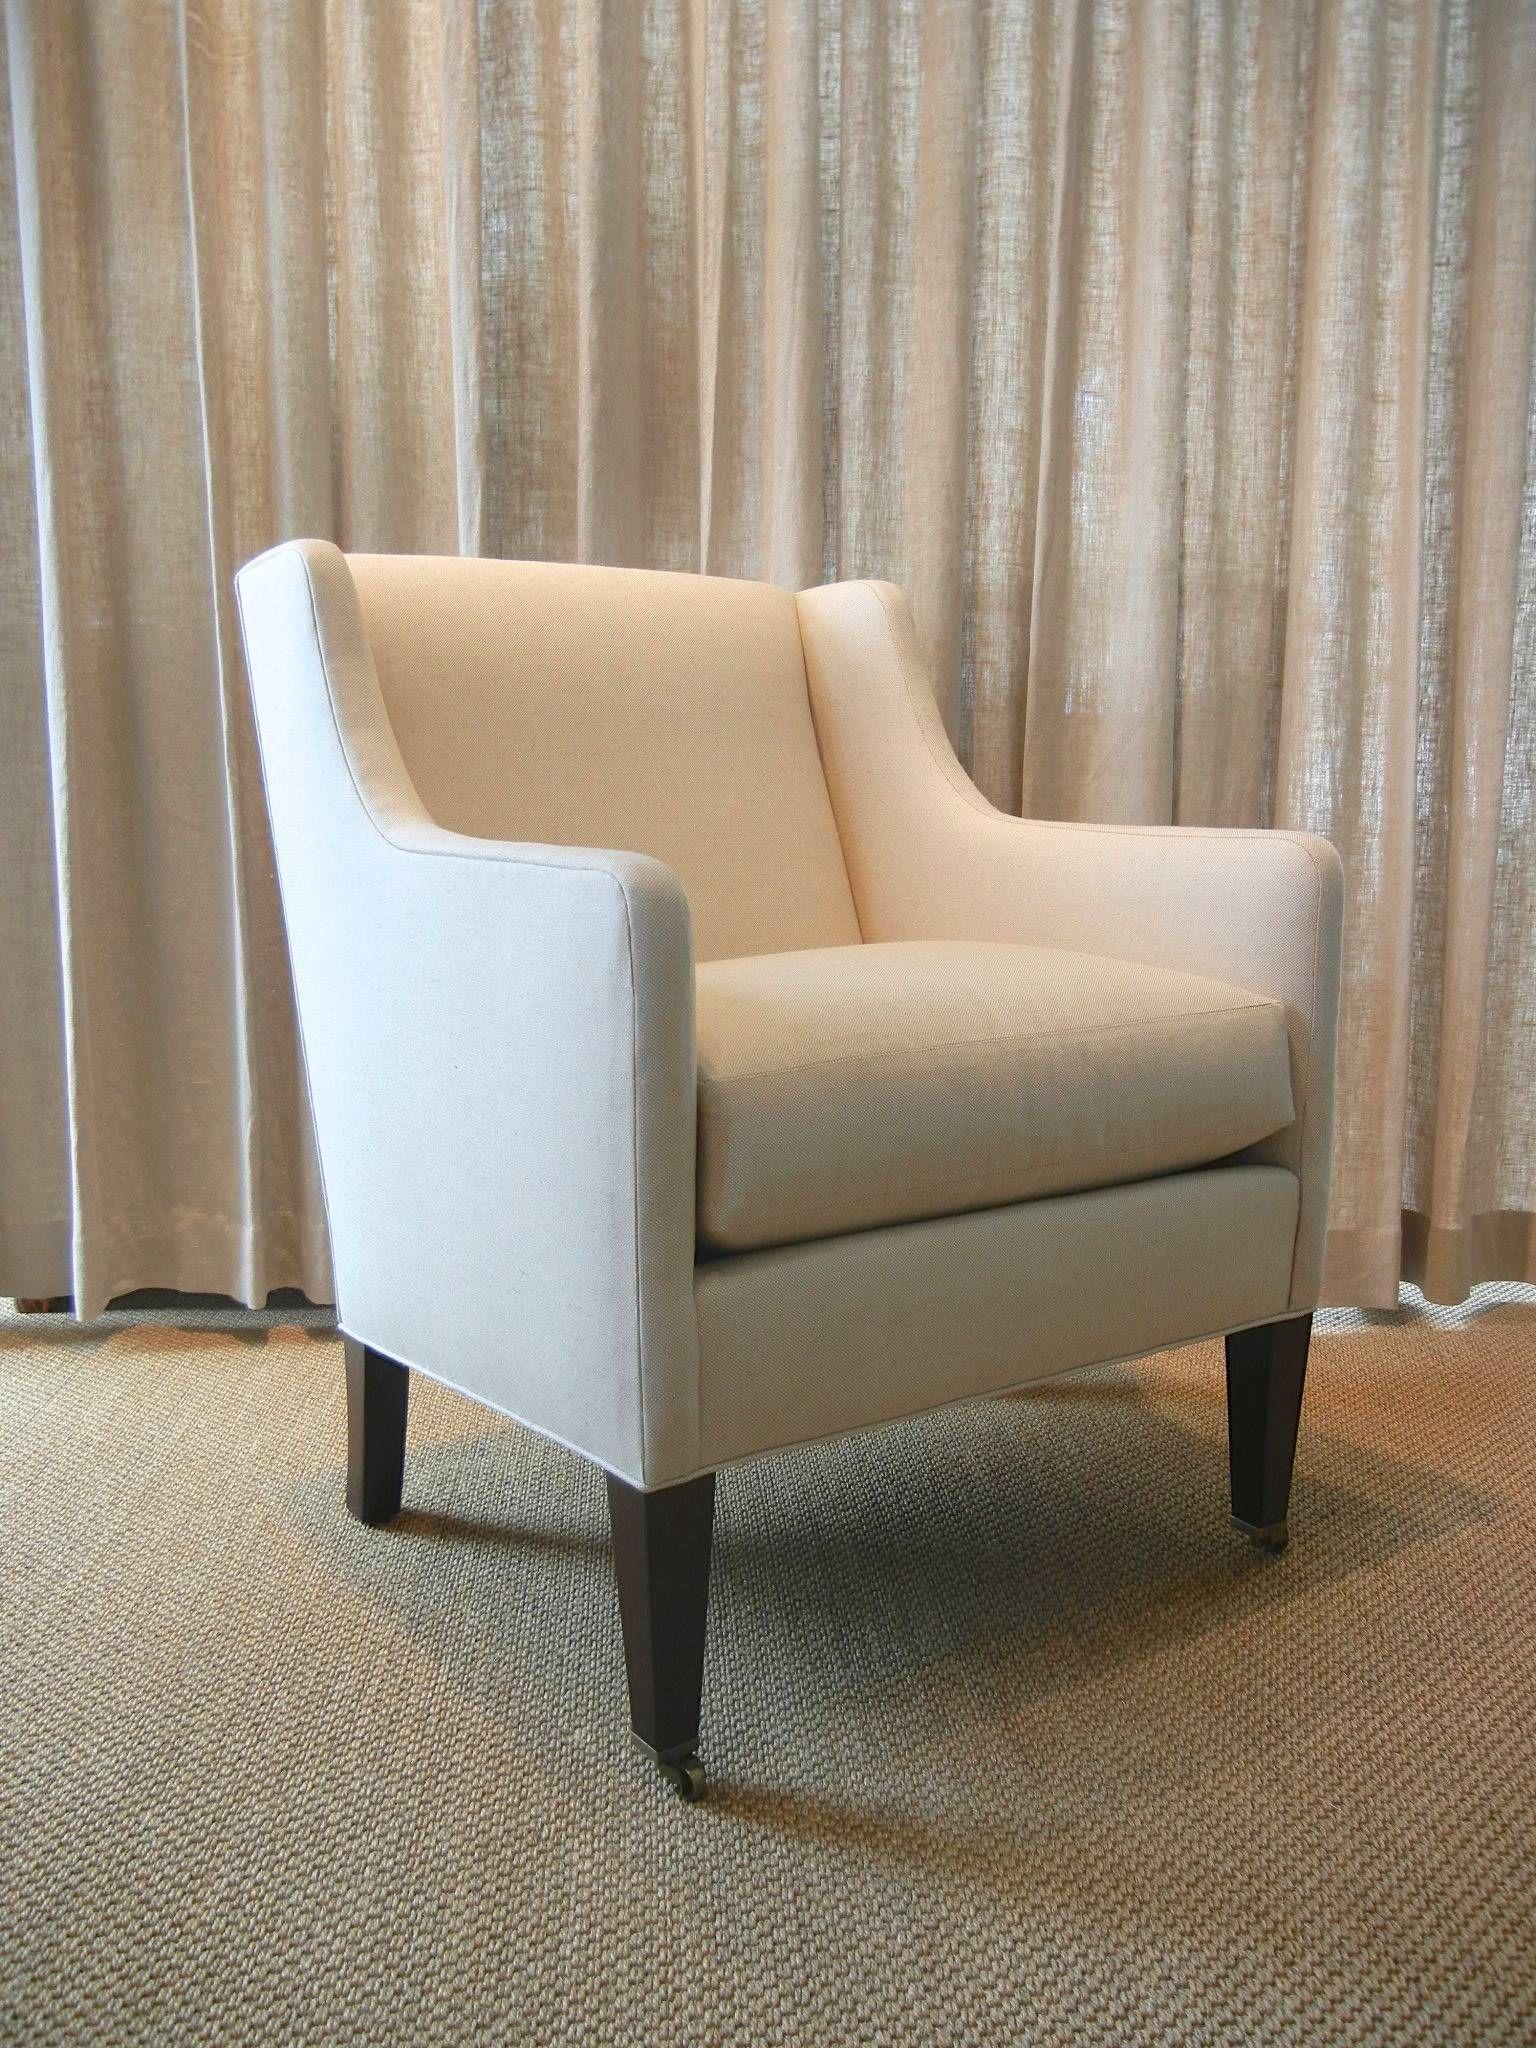 JAB Chair   Noah J. Fine Upholstery Designed By Chris Holt X X